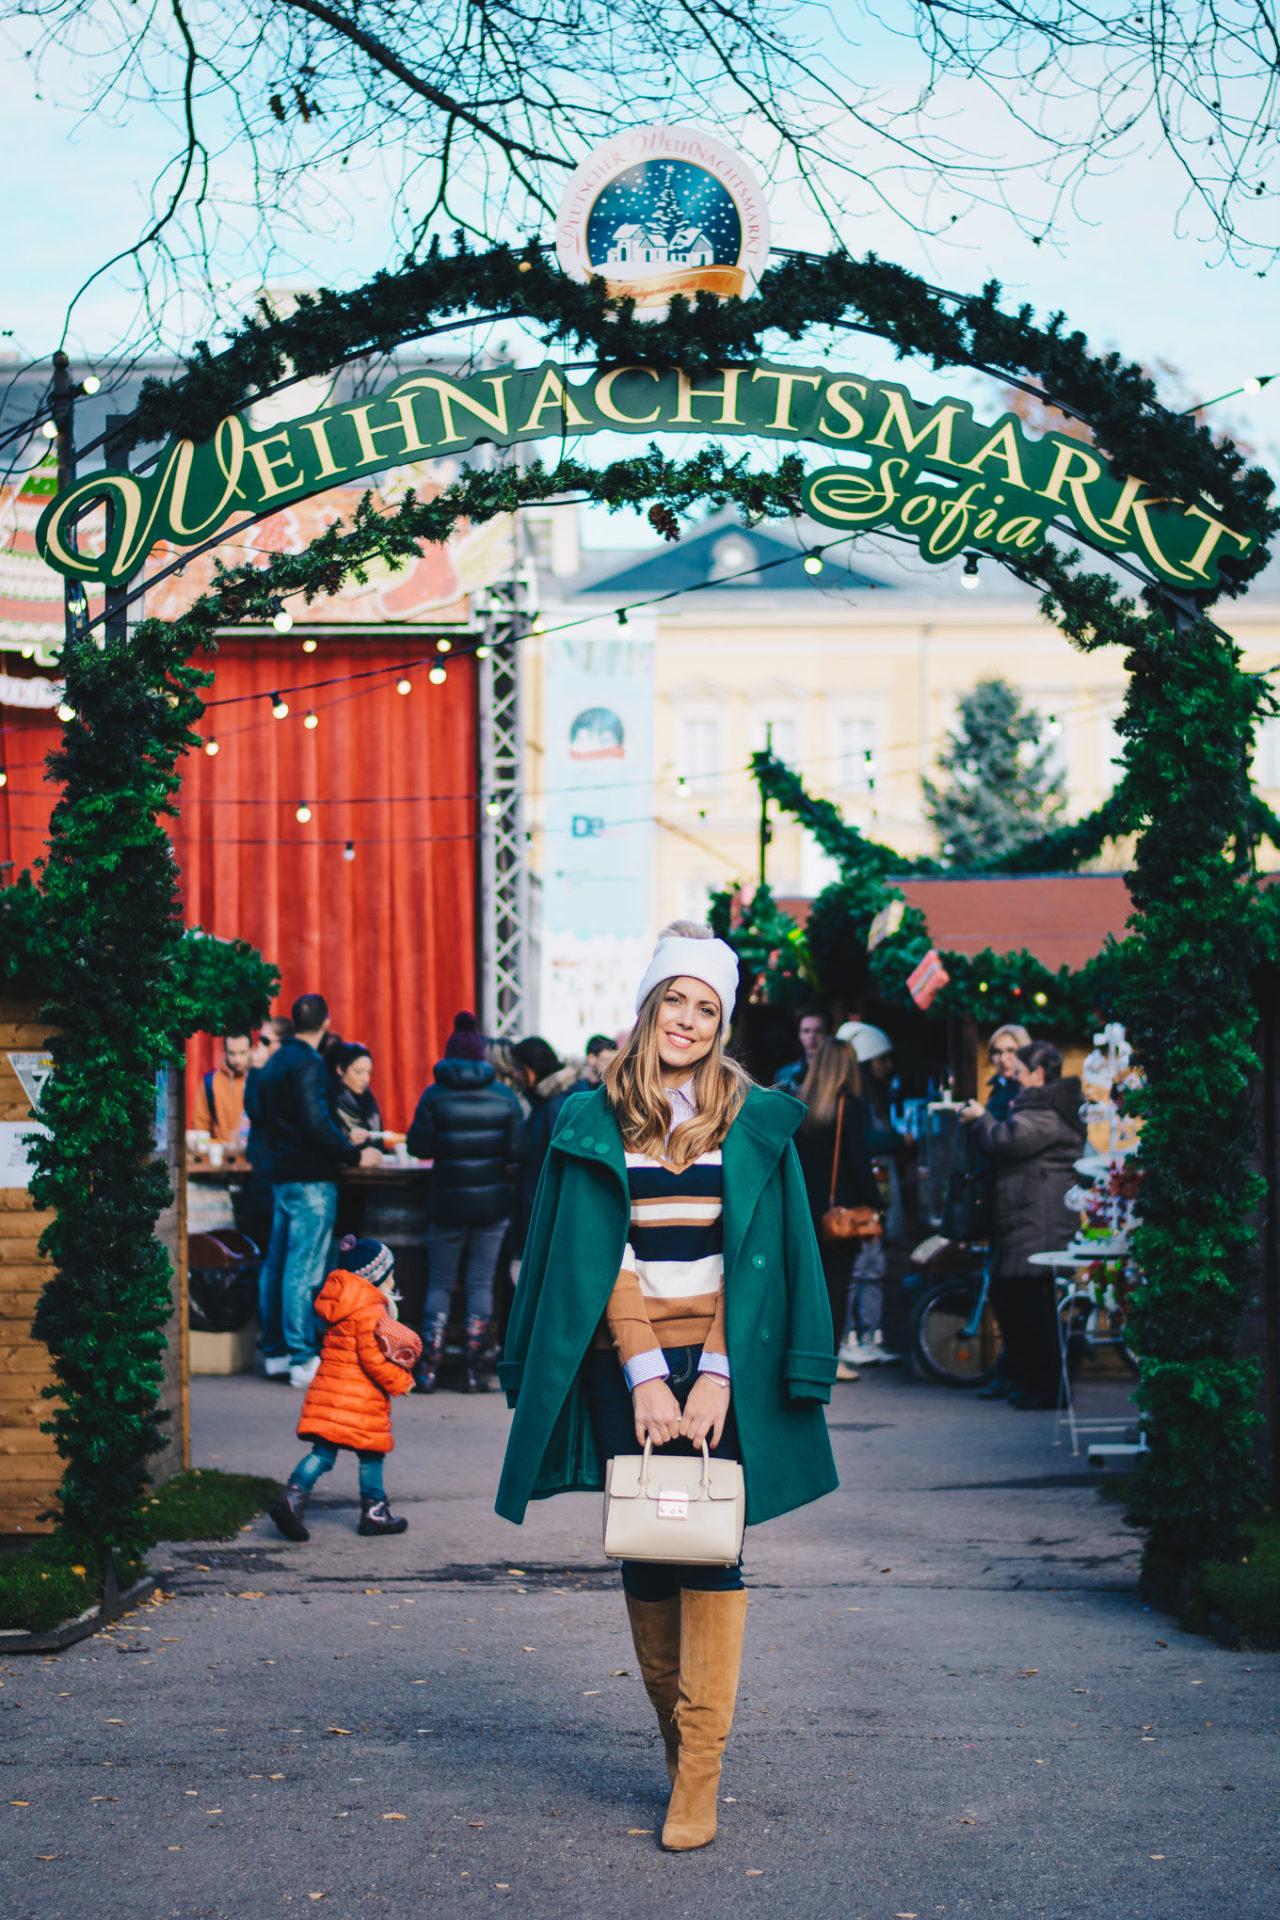 Benetton Christmas spirit